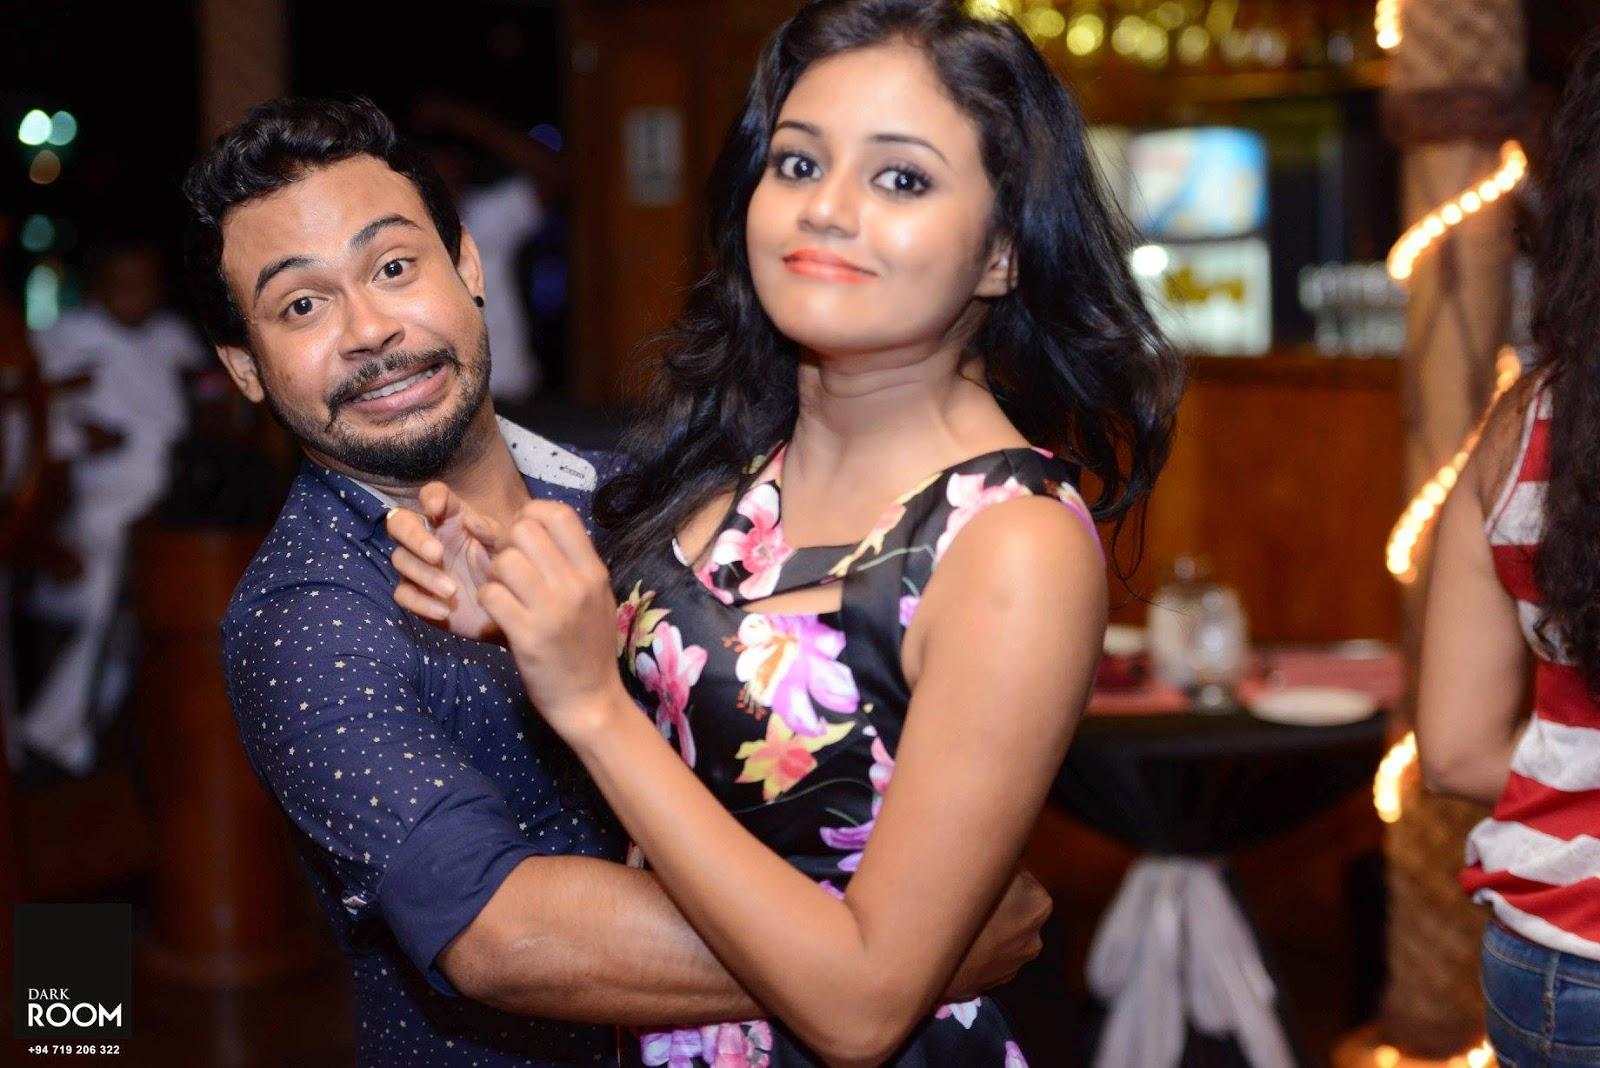 Dinakshie Priyasad hug